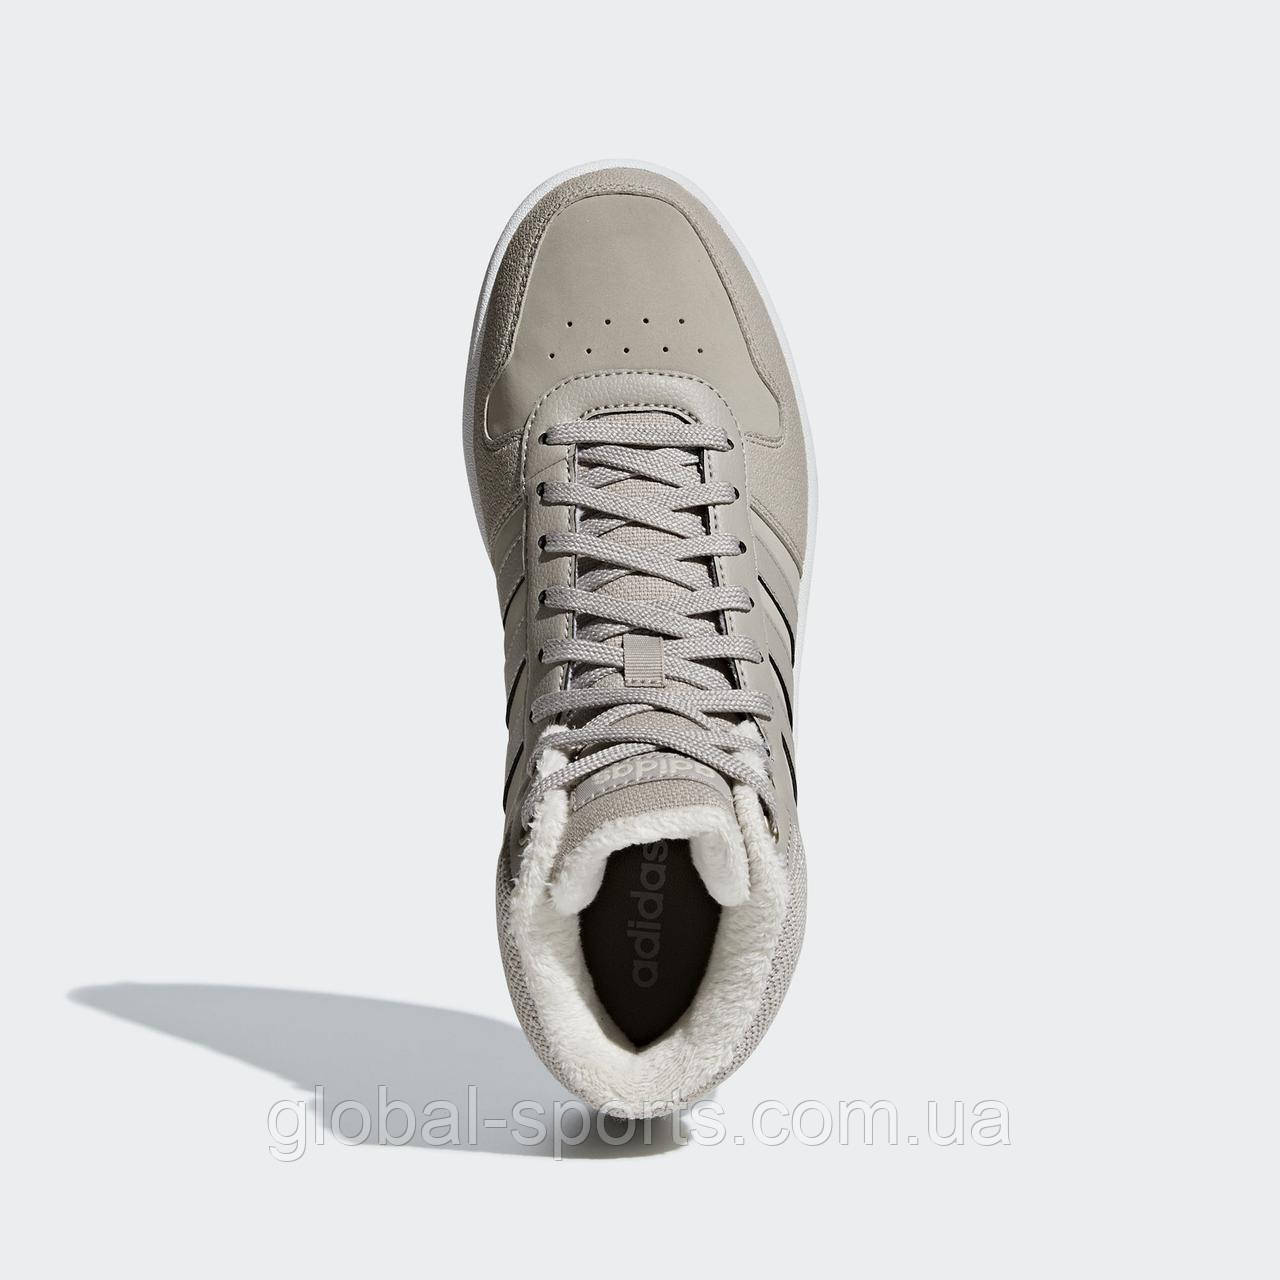 8aa2b9b4 Женские кроссовки Adidas Hoops 2.0 Mid W(Артикул:B42107): продажа ...